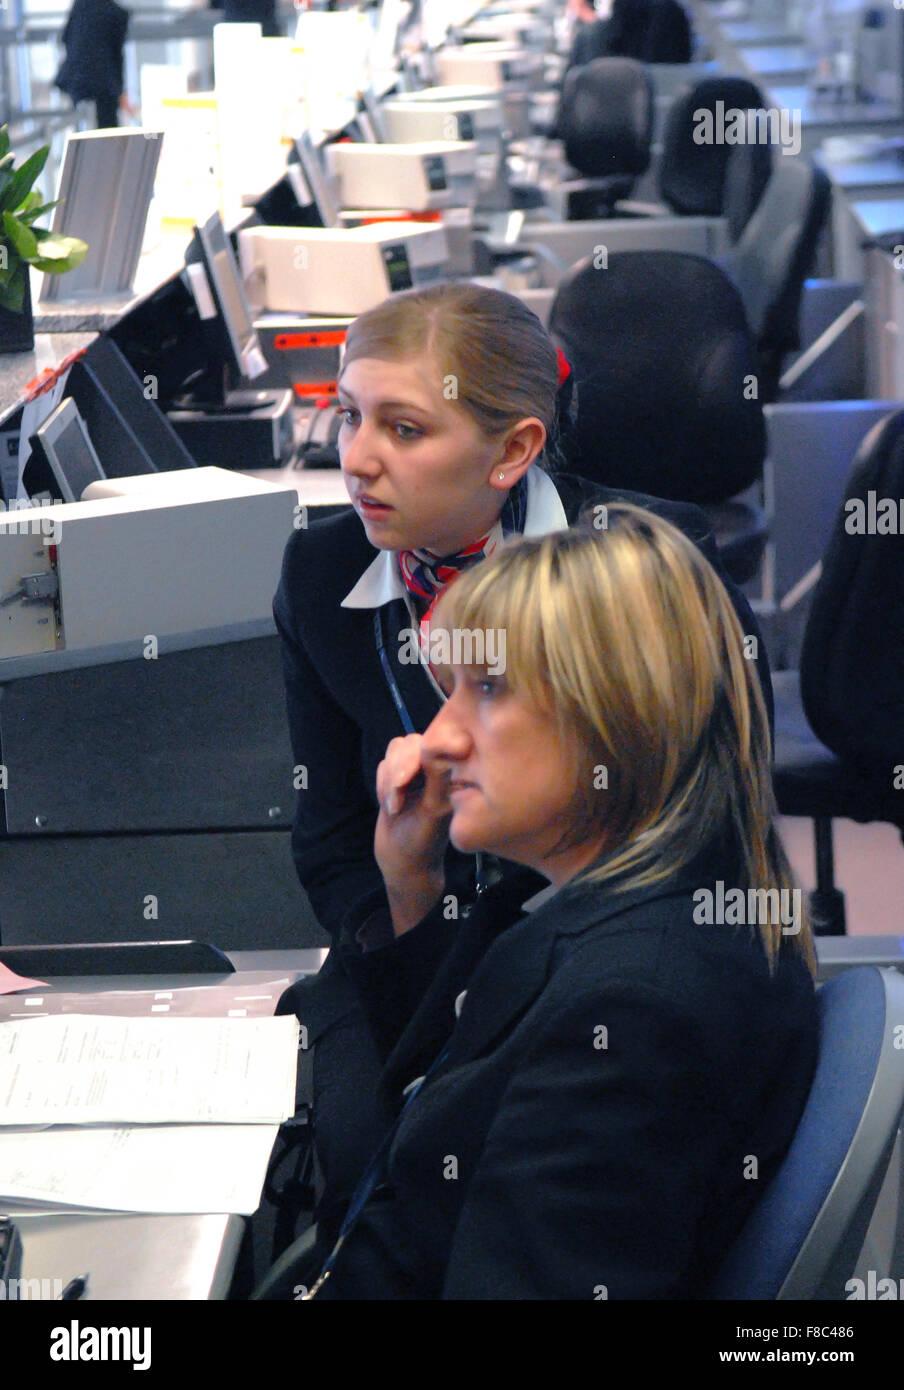 Check in desks at Aberdeen Airport in Aberdeen, Scotland. - Stock Image